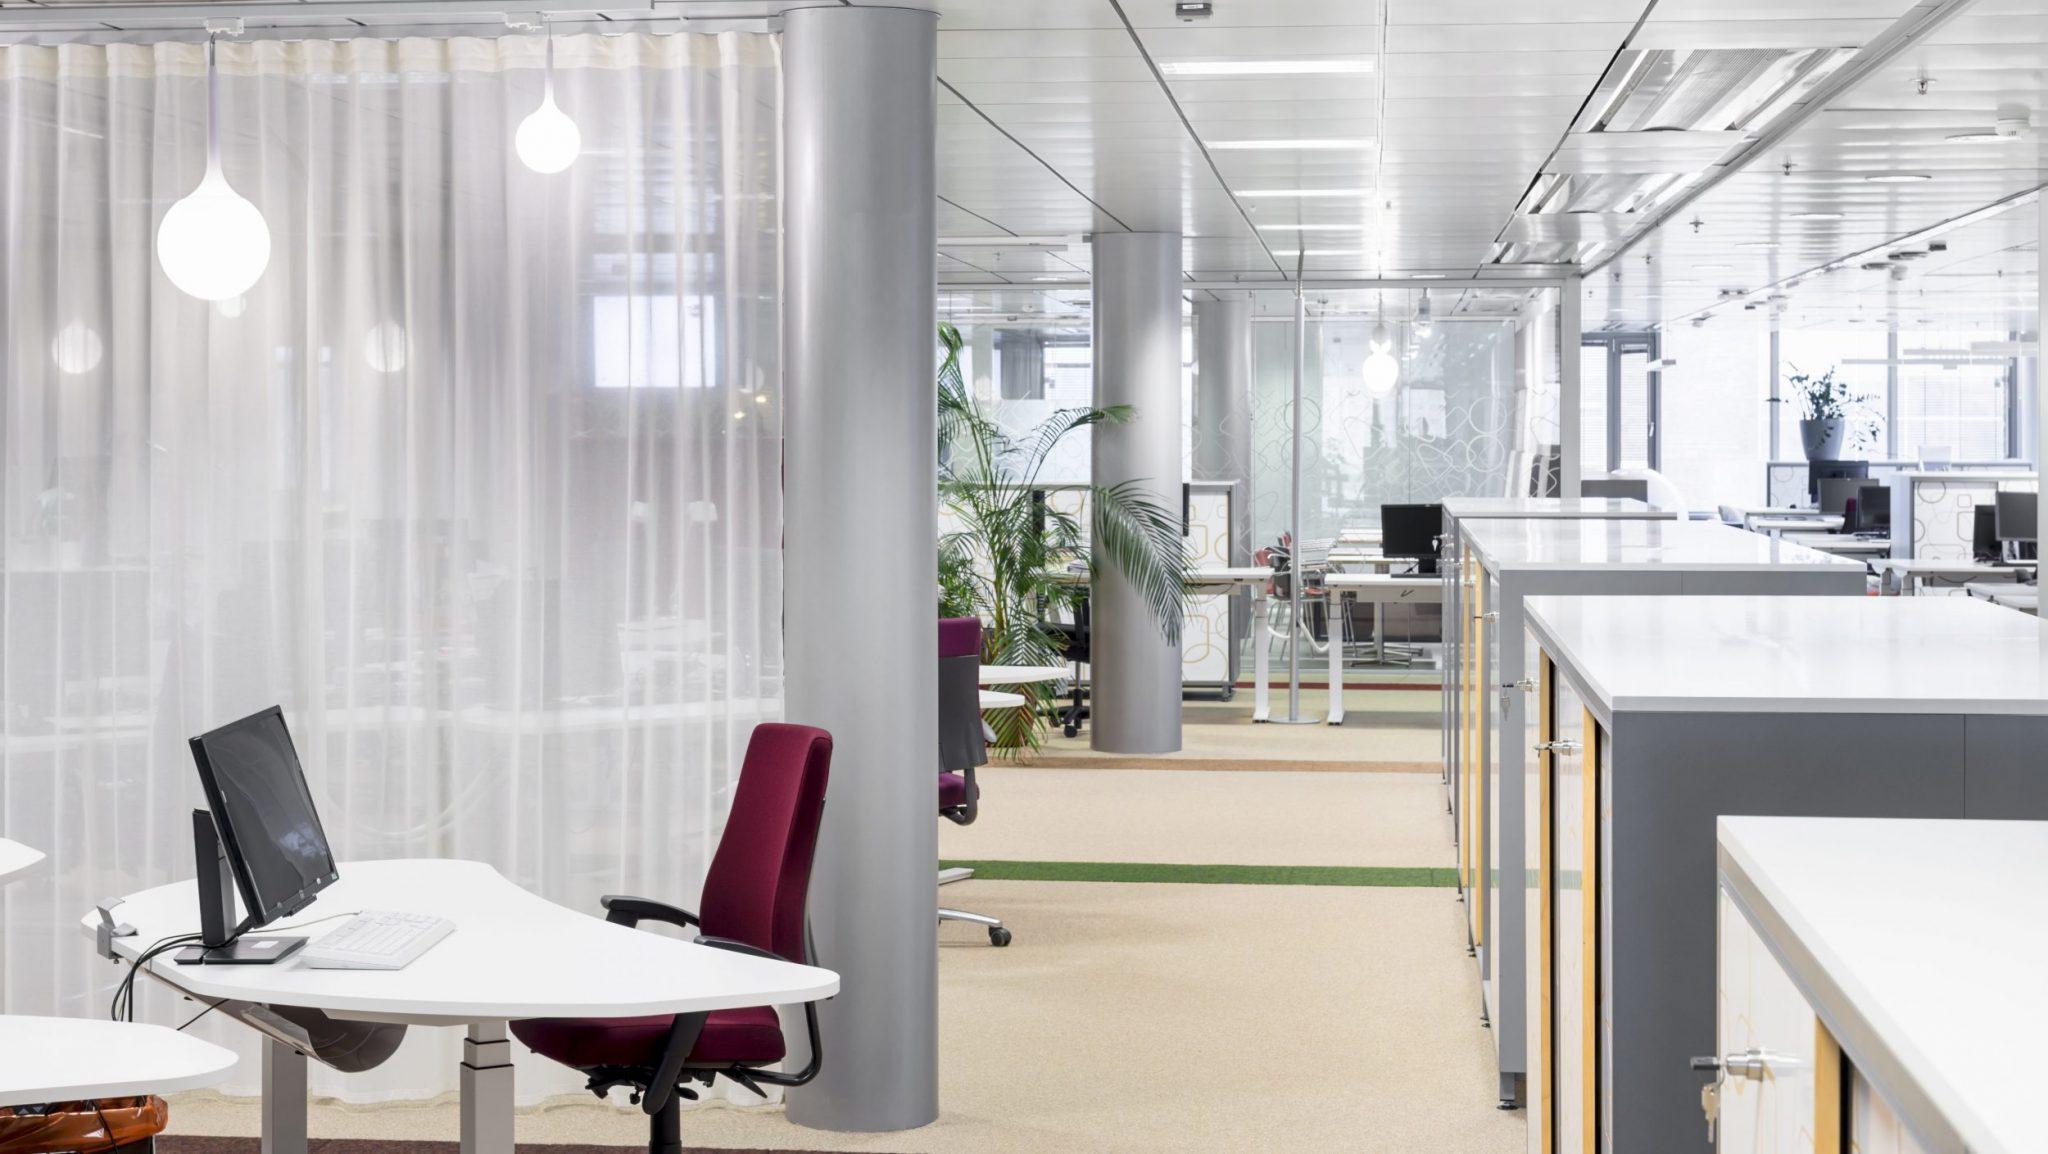 Vaasan-Helsinki-GI-Project-5